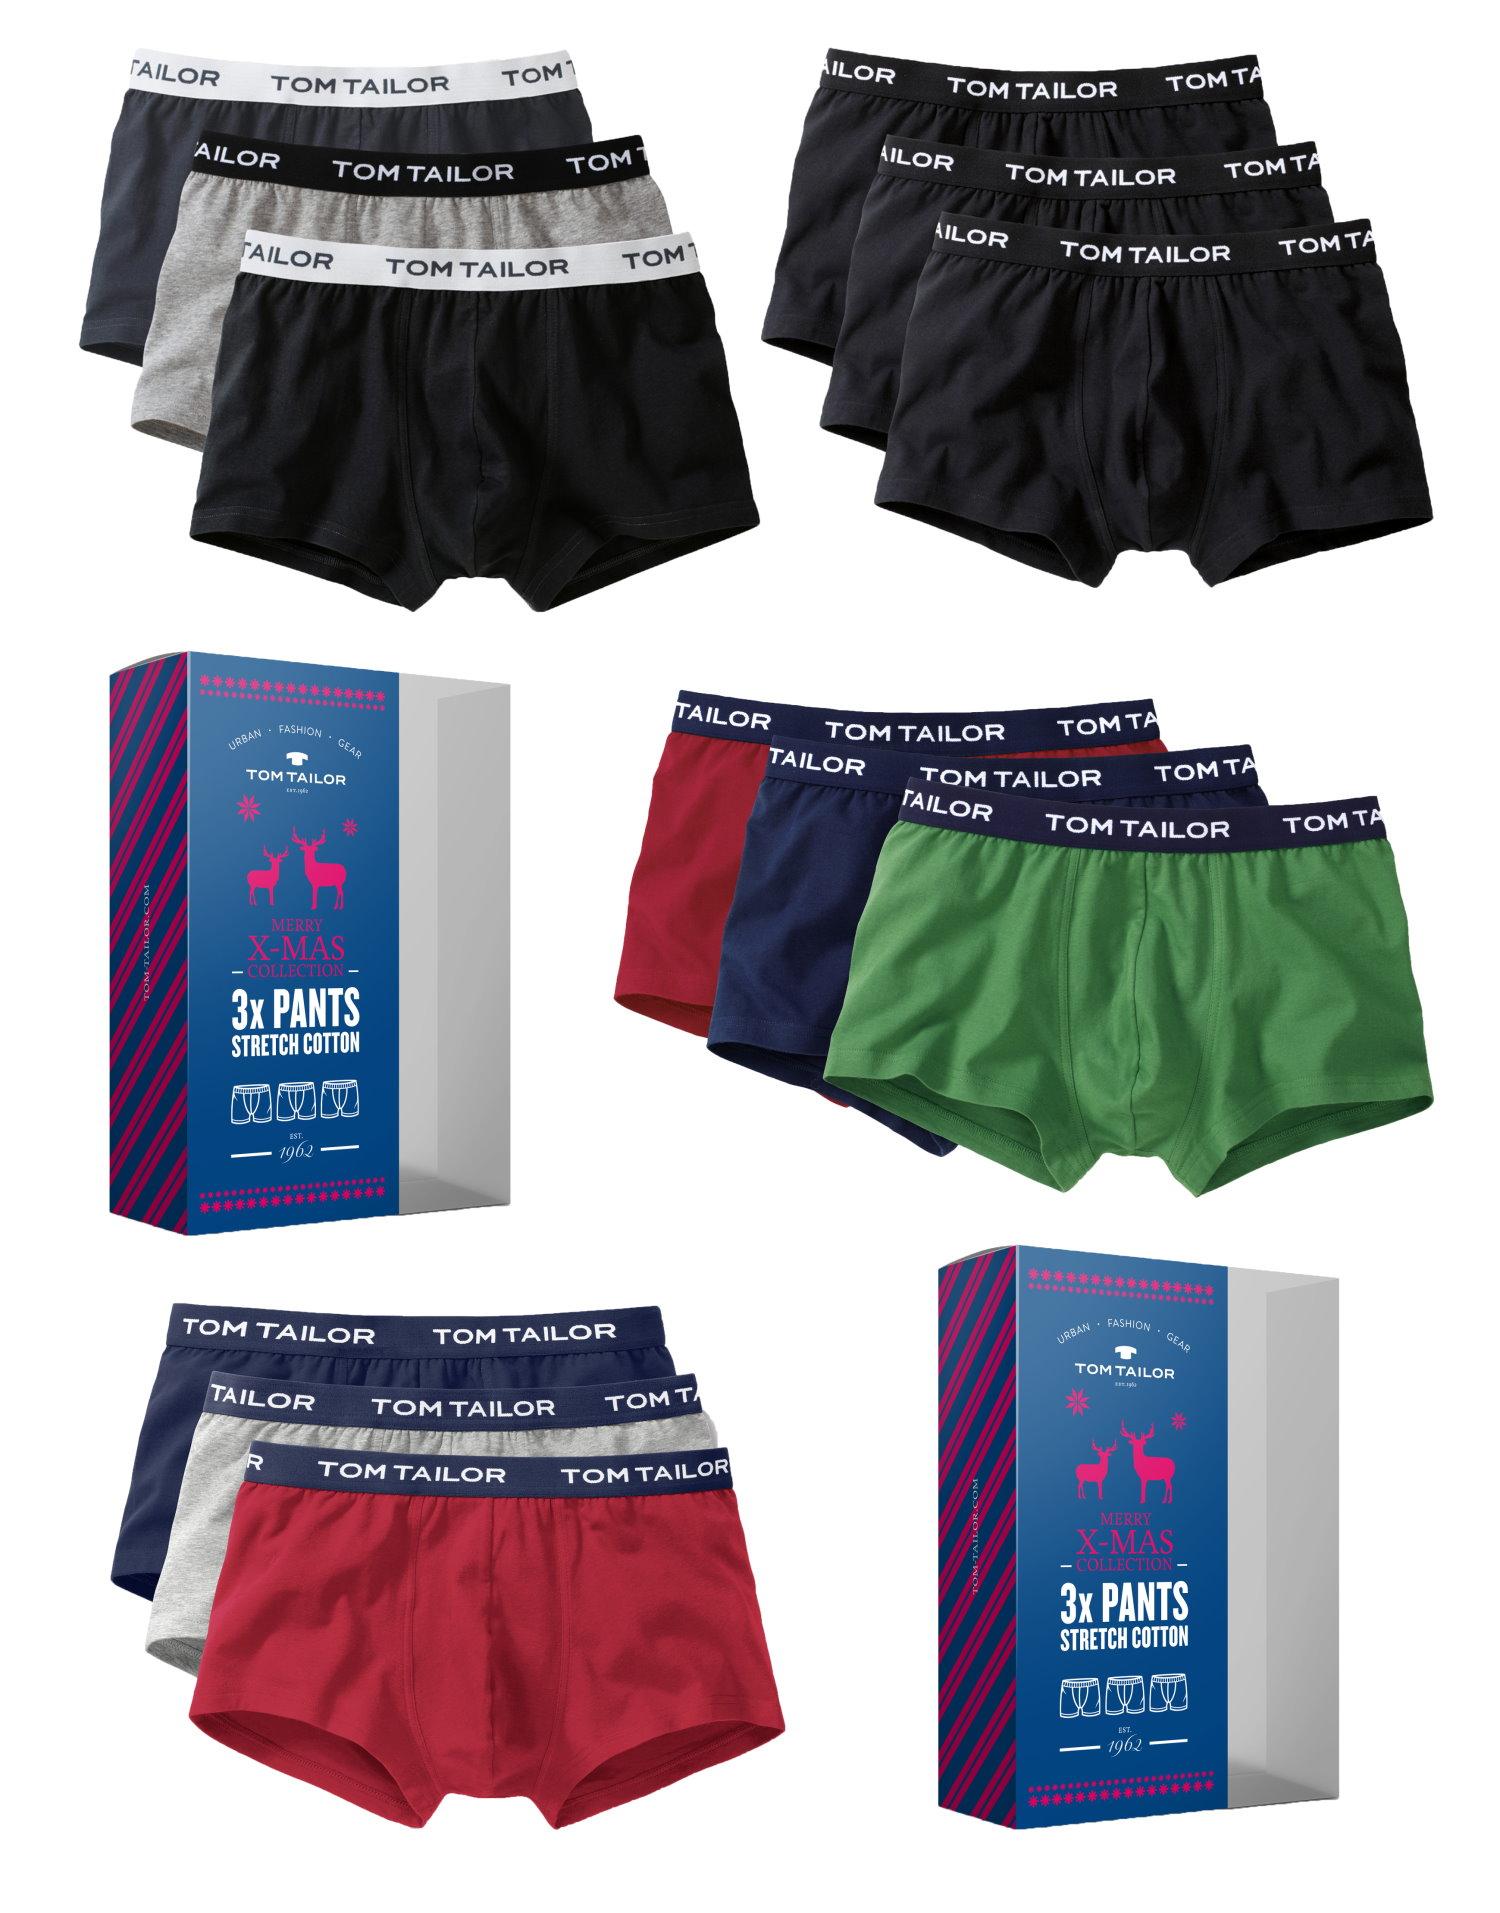 3er Pack Tom Tailor Pants Boxer Shorts Hipster Slips Weihnachts ... d6e5b0f00c